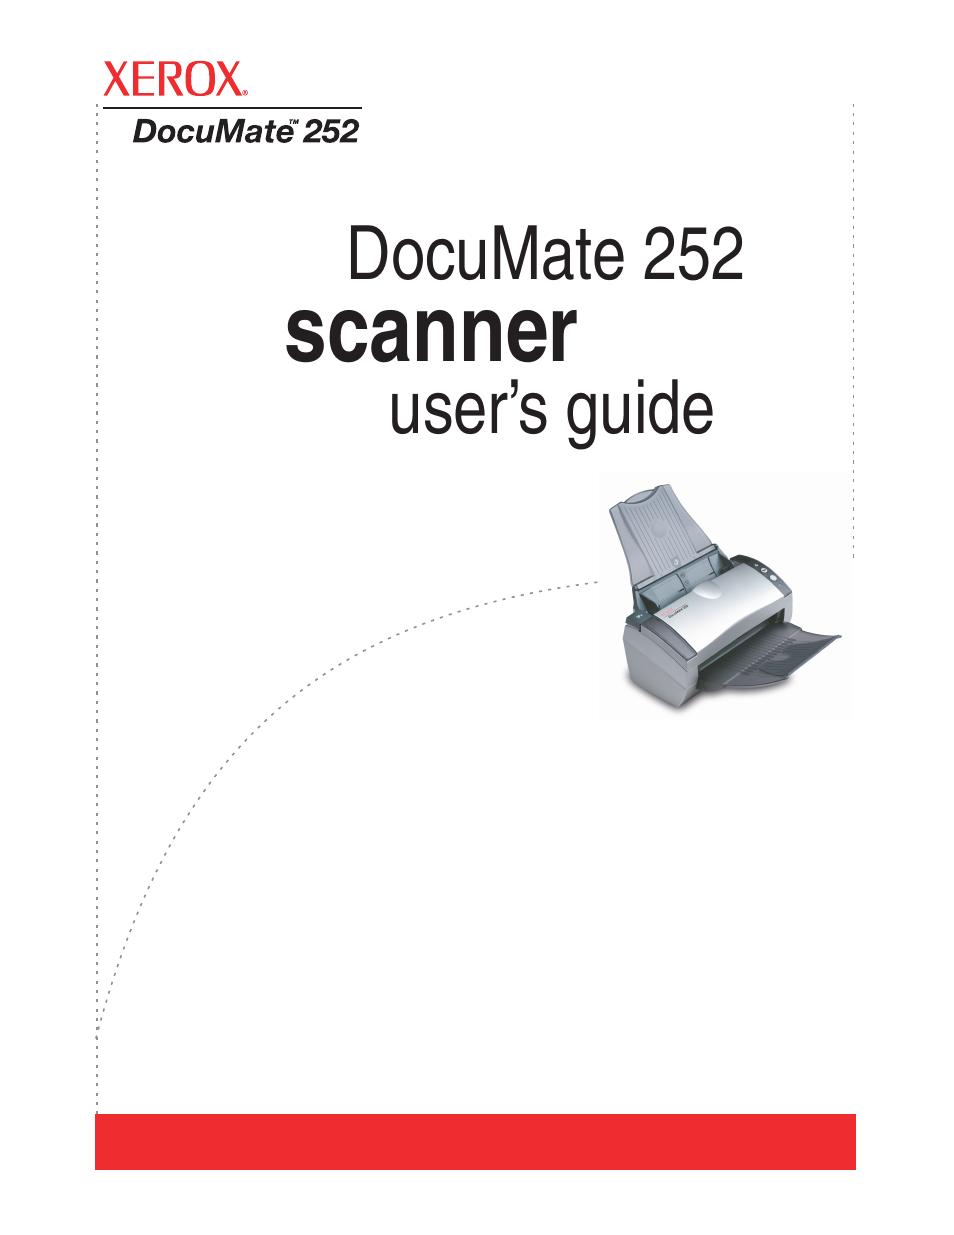 xerox documate 252 user manual 133 pages rh manualsdir com xerox documate 262 service manual DocuMate 252 Driver Windows 7